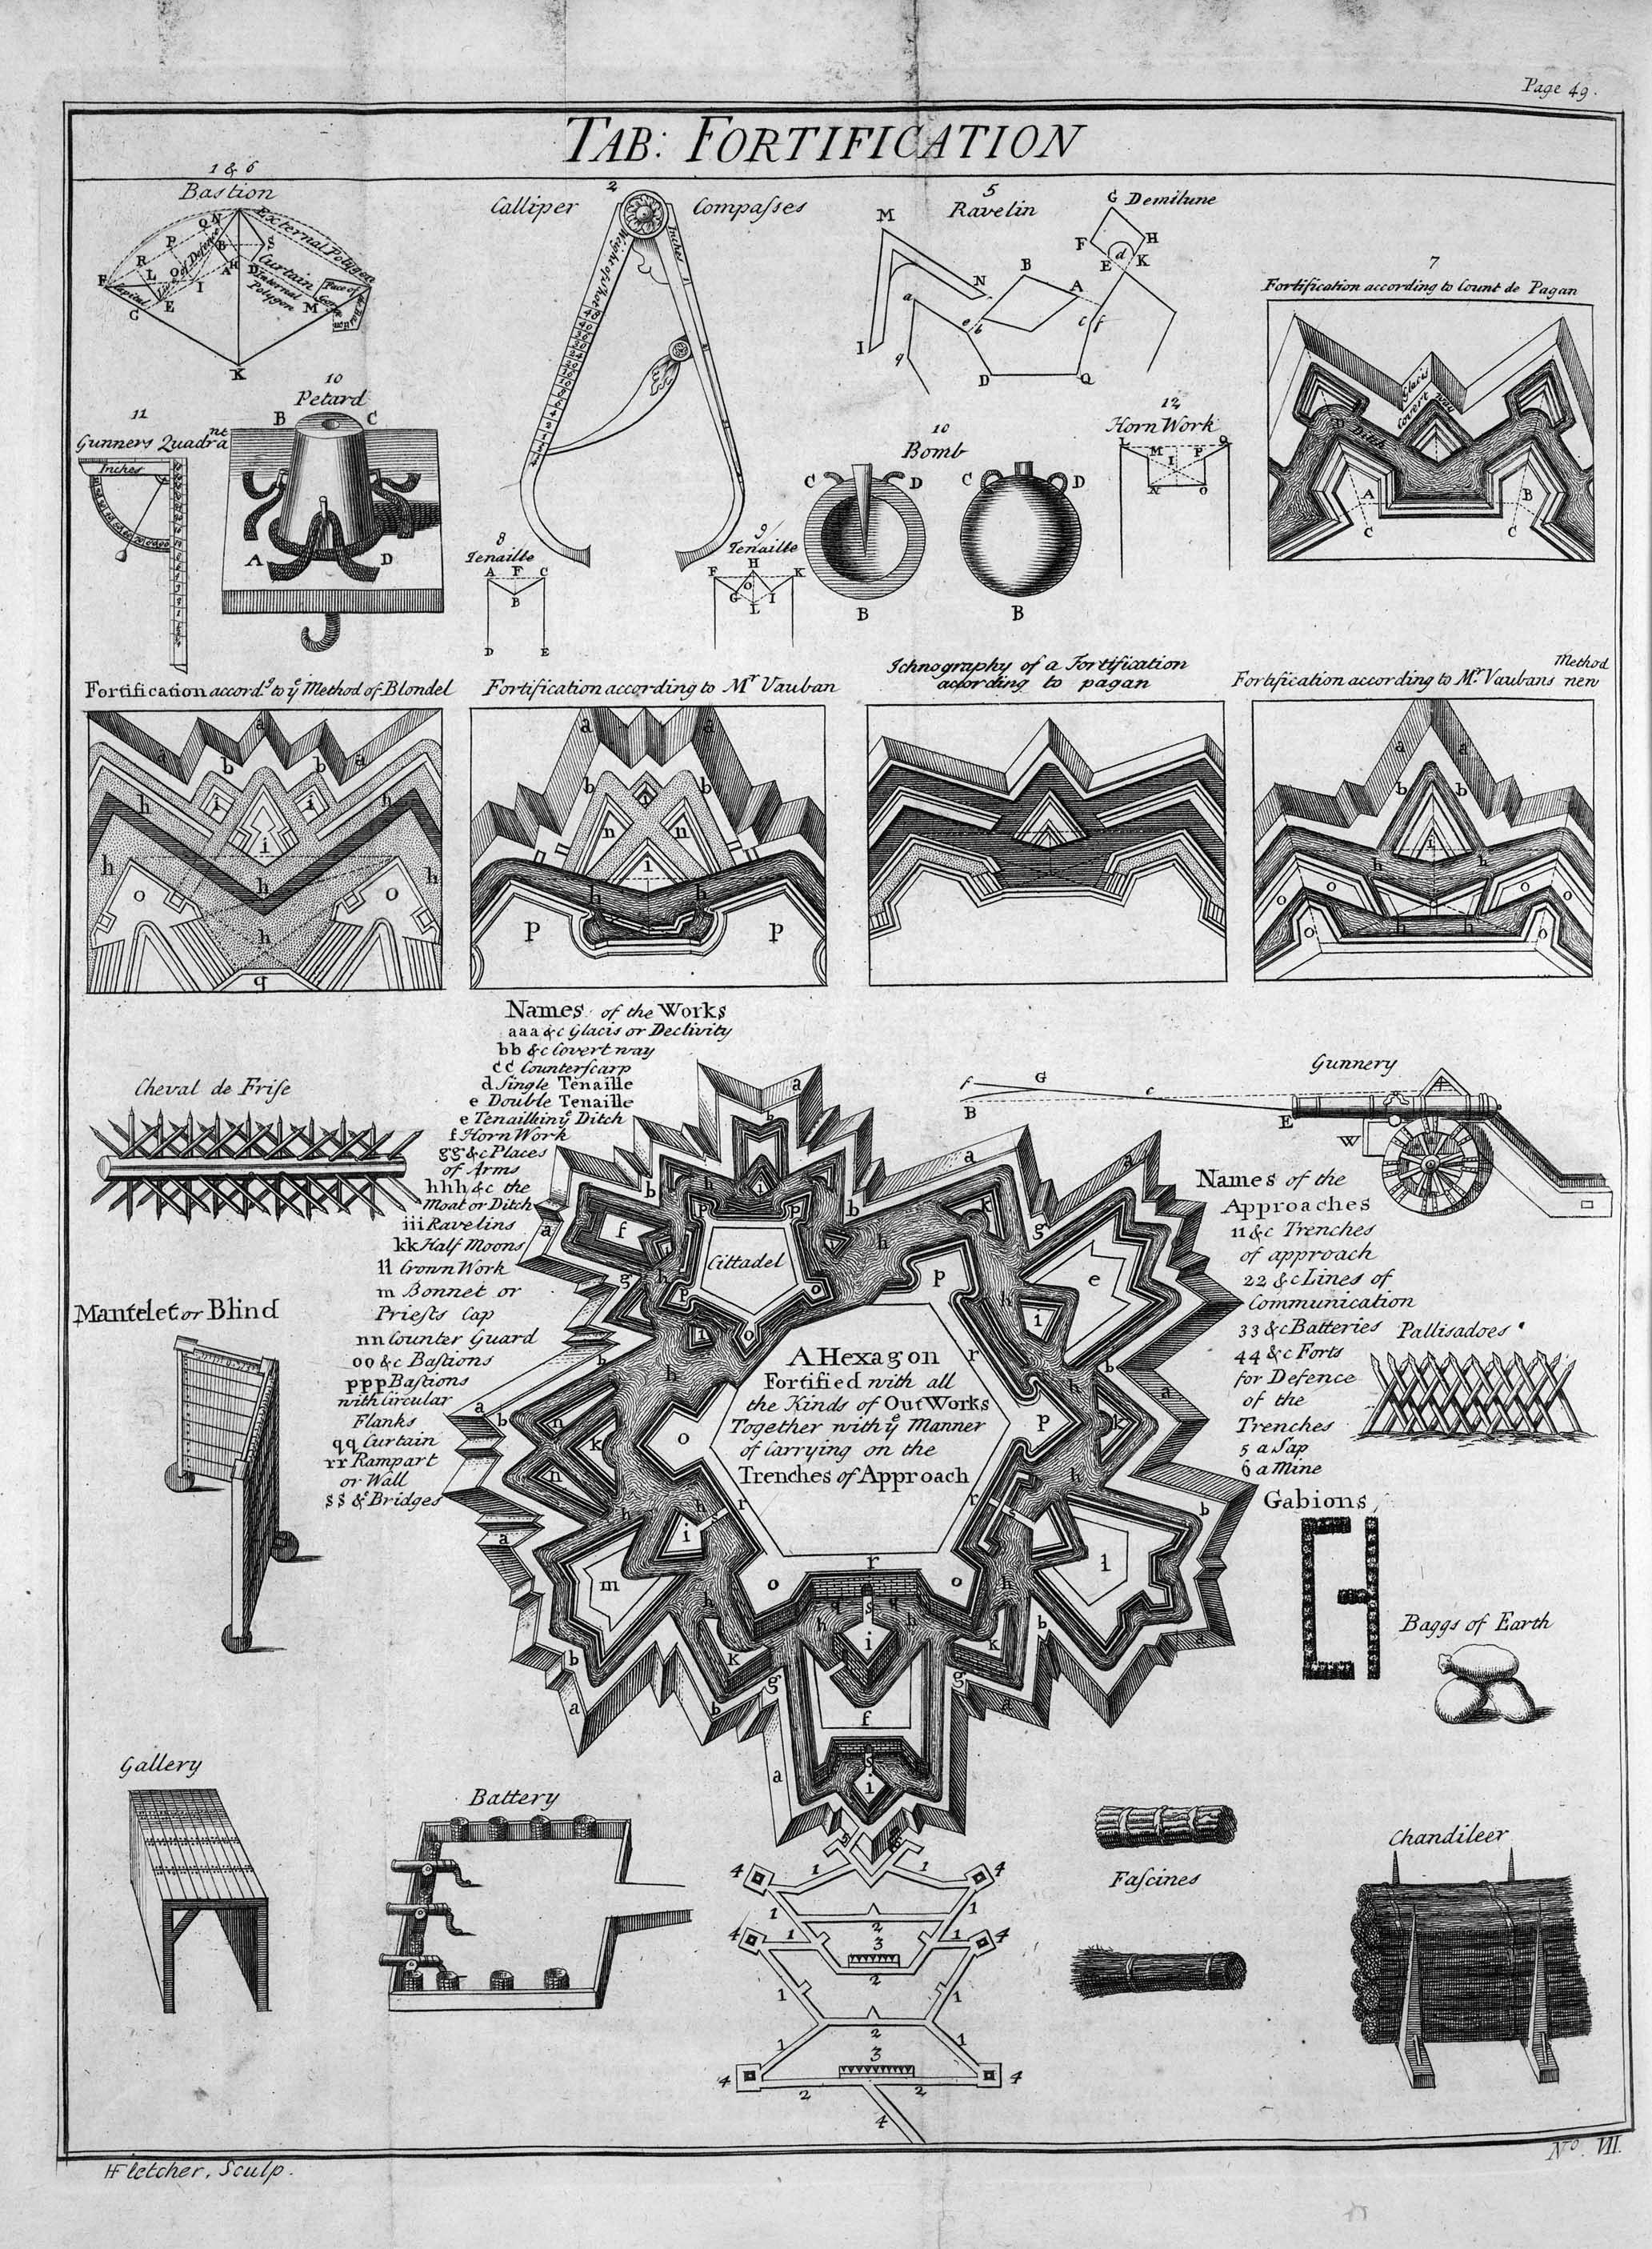 ableofatypicalbastionfort,1728.hedevelopmentofbastionfortsresultedfromtheincreaseduseofcannonsandfirearmsinthe14thcentury.